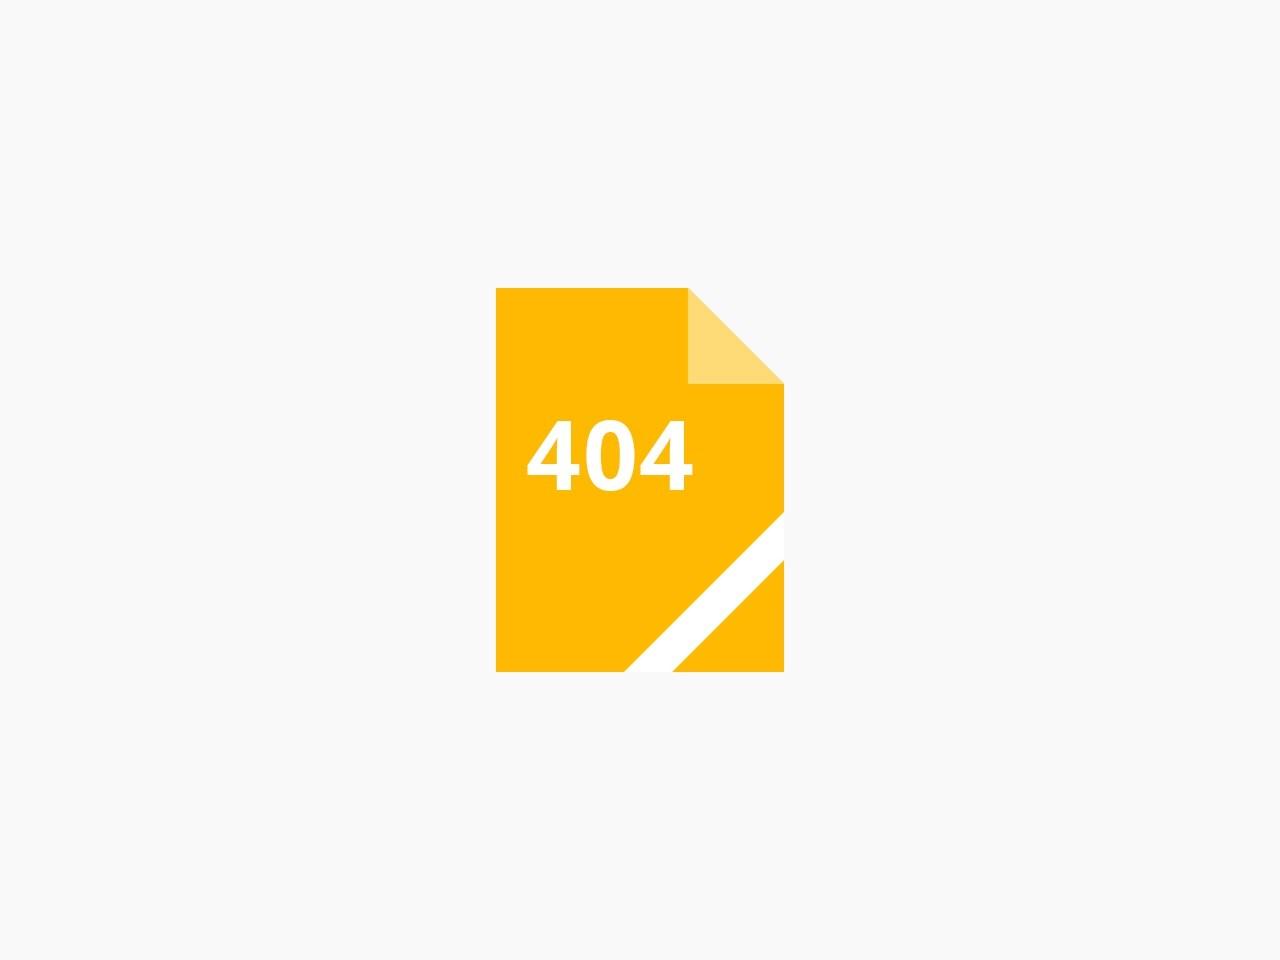 https://blogs.yahoo.co.jp/makkari123yakuba/56808818.html